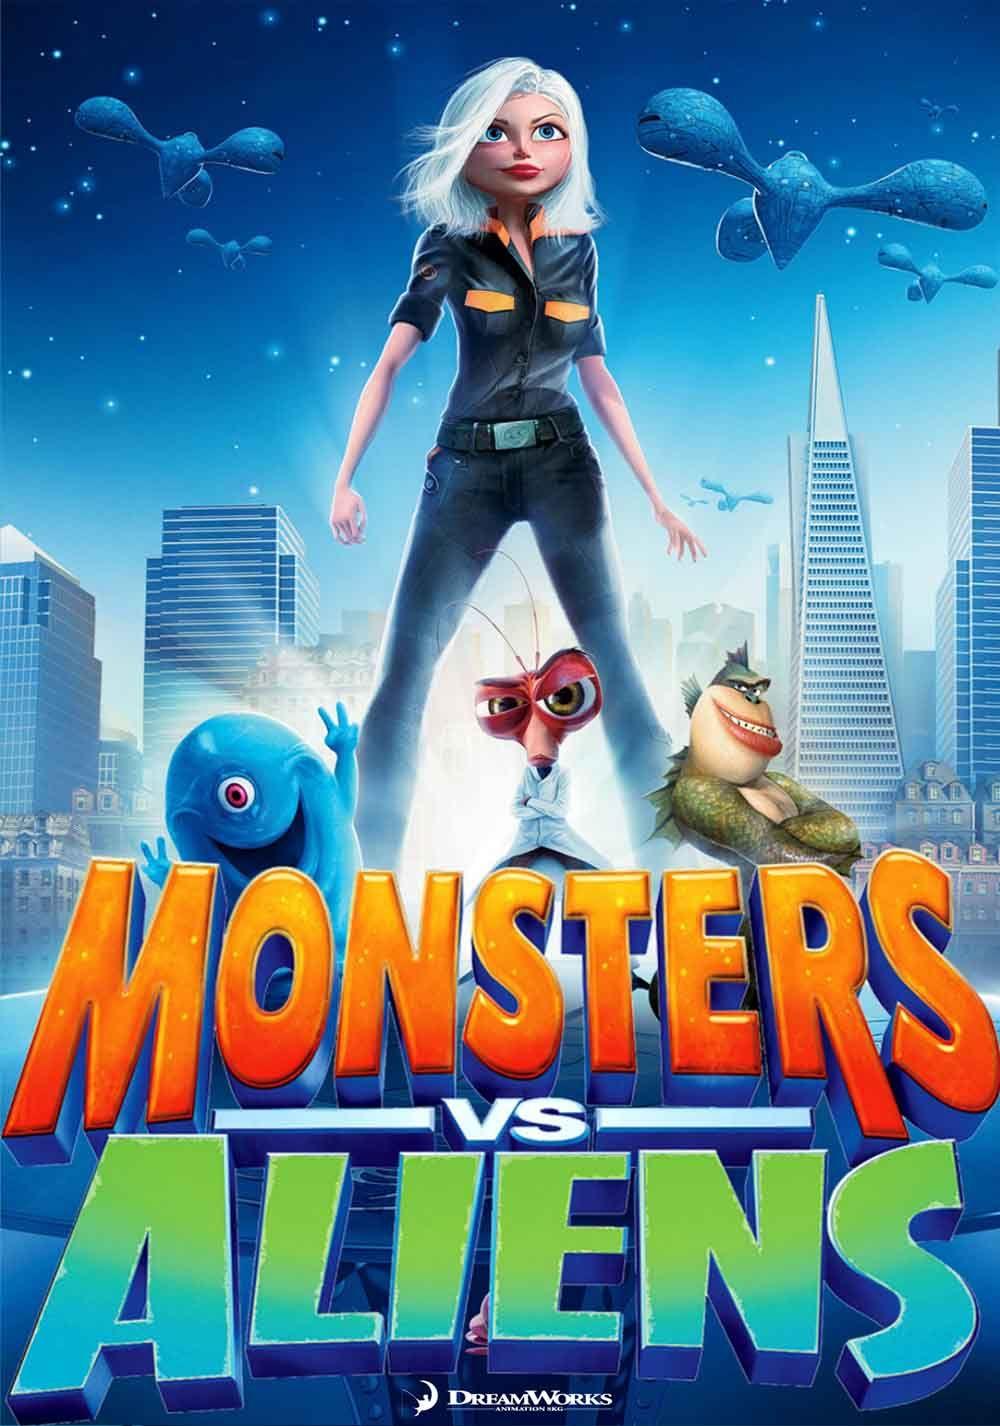 Alien Full Movie 123movies